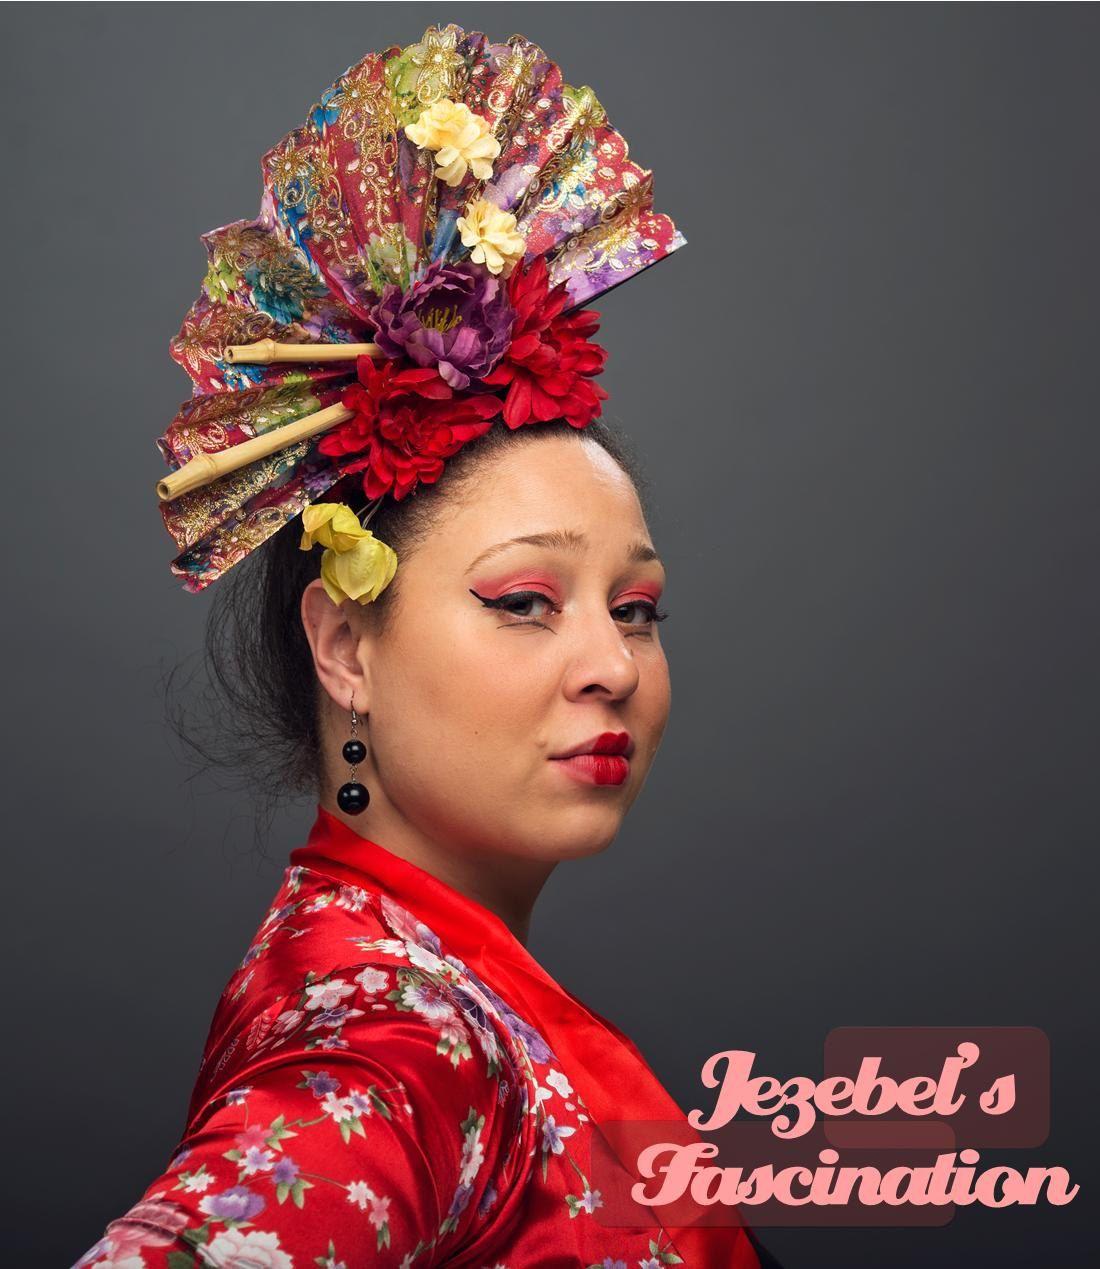 Asian Persuasion-Red Fan Fascinator Lucky Bamboo Green Chinese Lantern Flower Headdress Purple Poppy White Headpiece Geisha Costume Hat - pinned by ...  sc 1 st  Pinterest & Asian Persuasion Red Fan Fascinator Lucky Bamboo Green Chinese ...